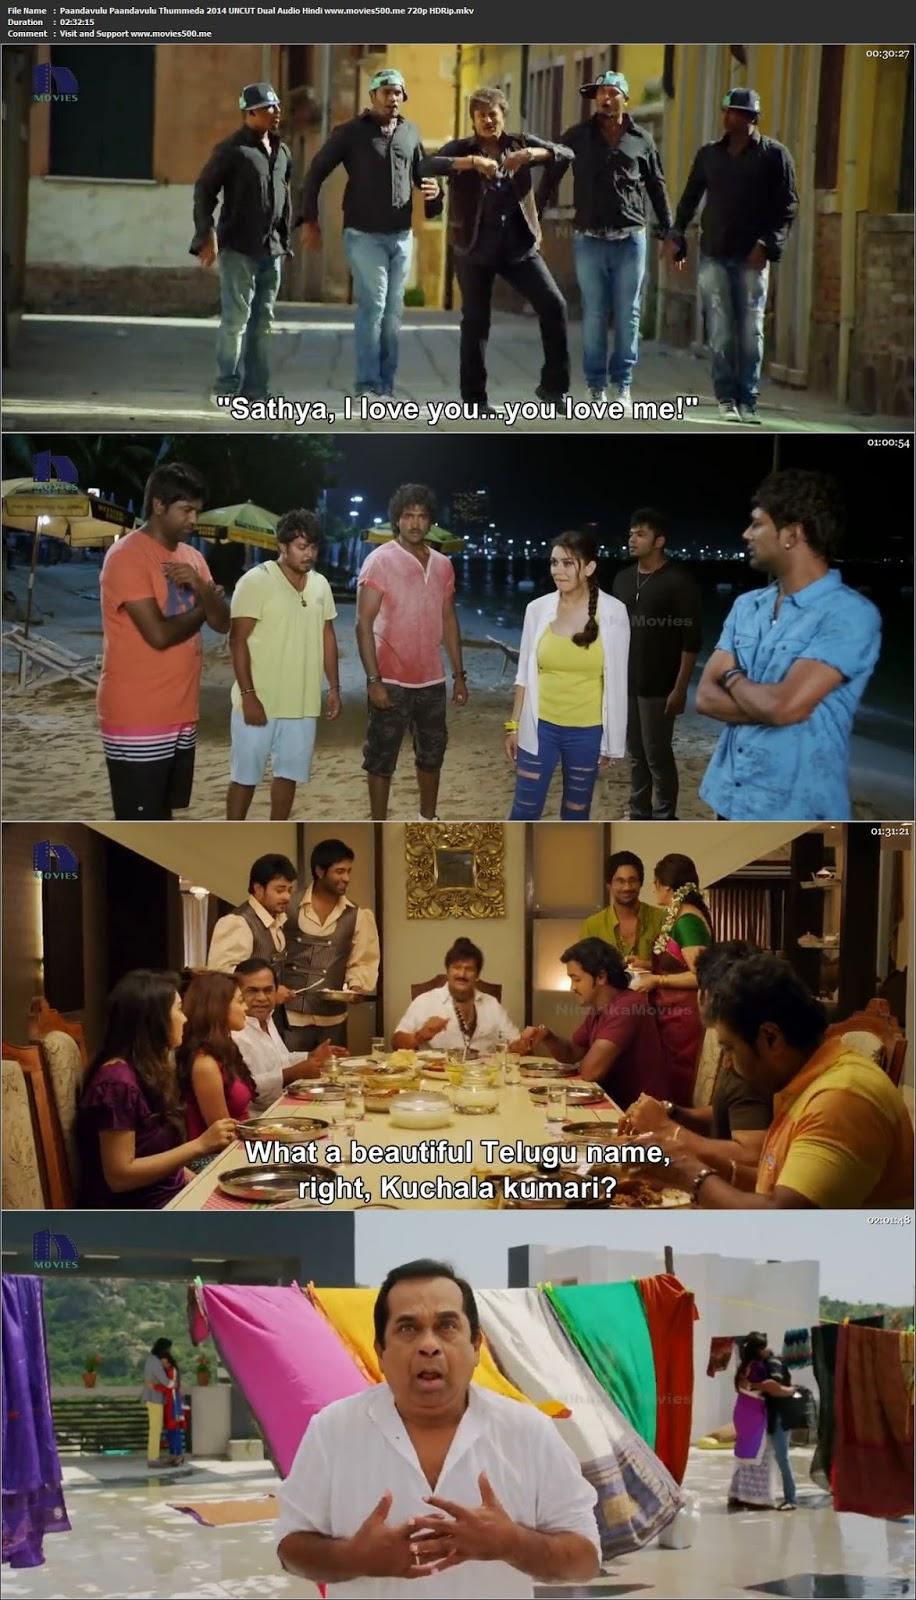 Paandavulu Paandavulu Thummeda 2014 UNCUT Dual Audio Hindi HDRip 720p at sweac.org